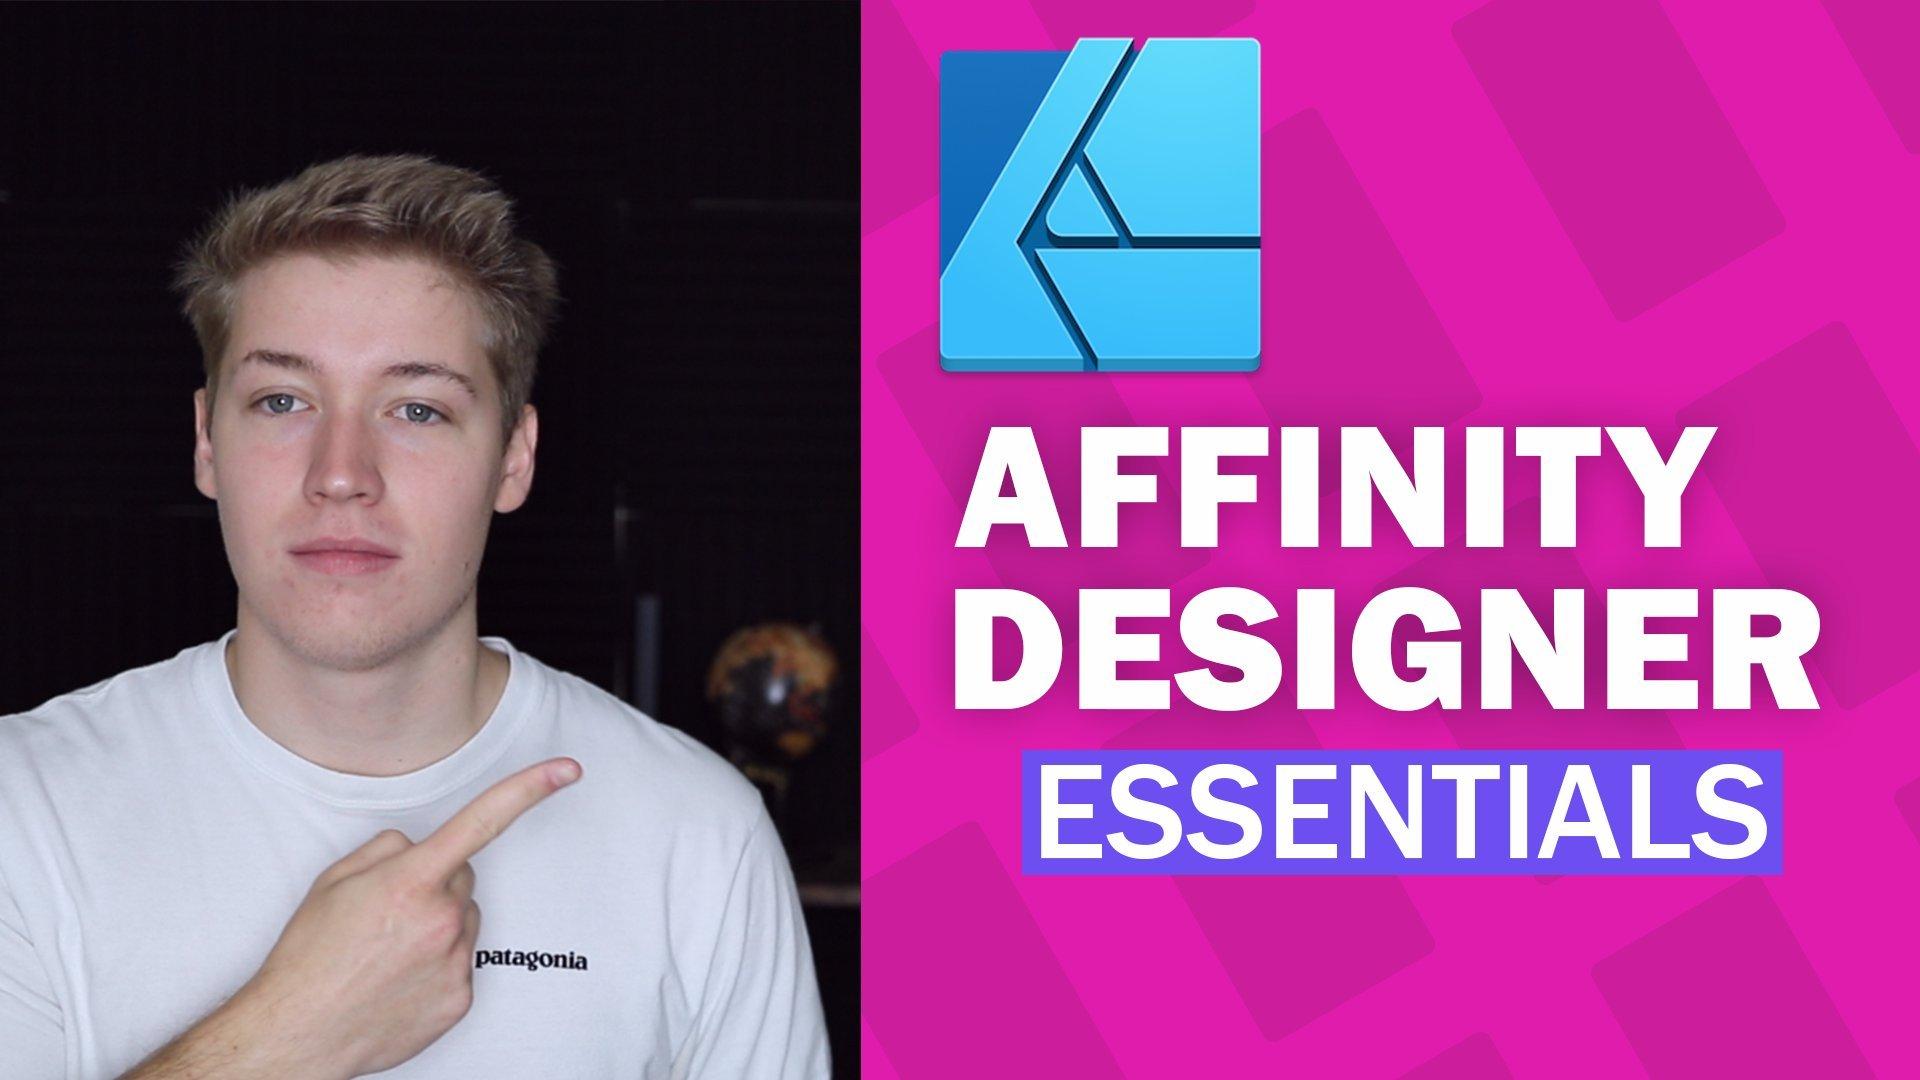 Affinity Designer Essentials: From Beginner to Advanced